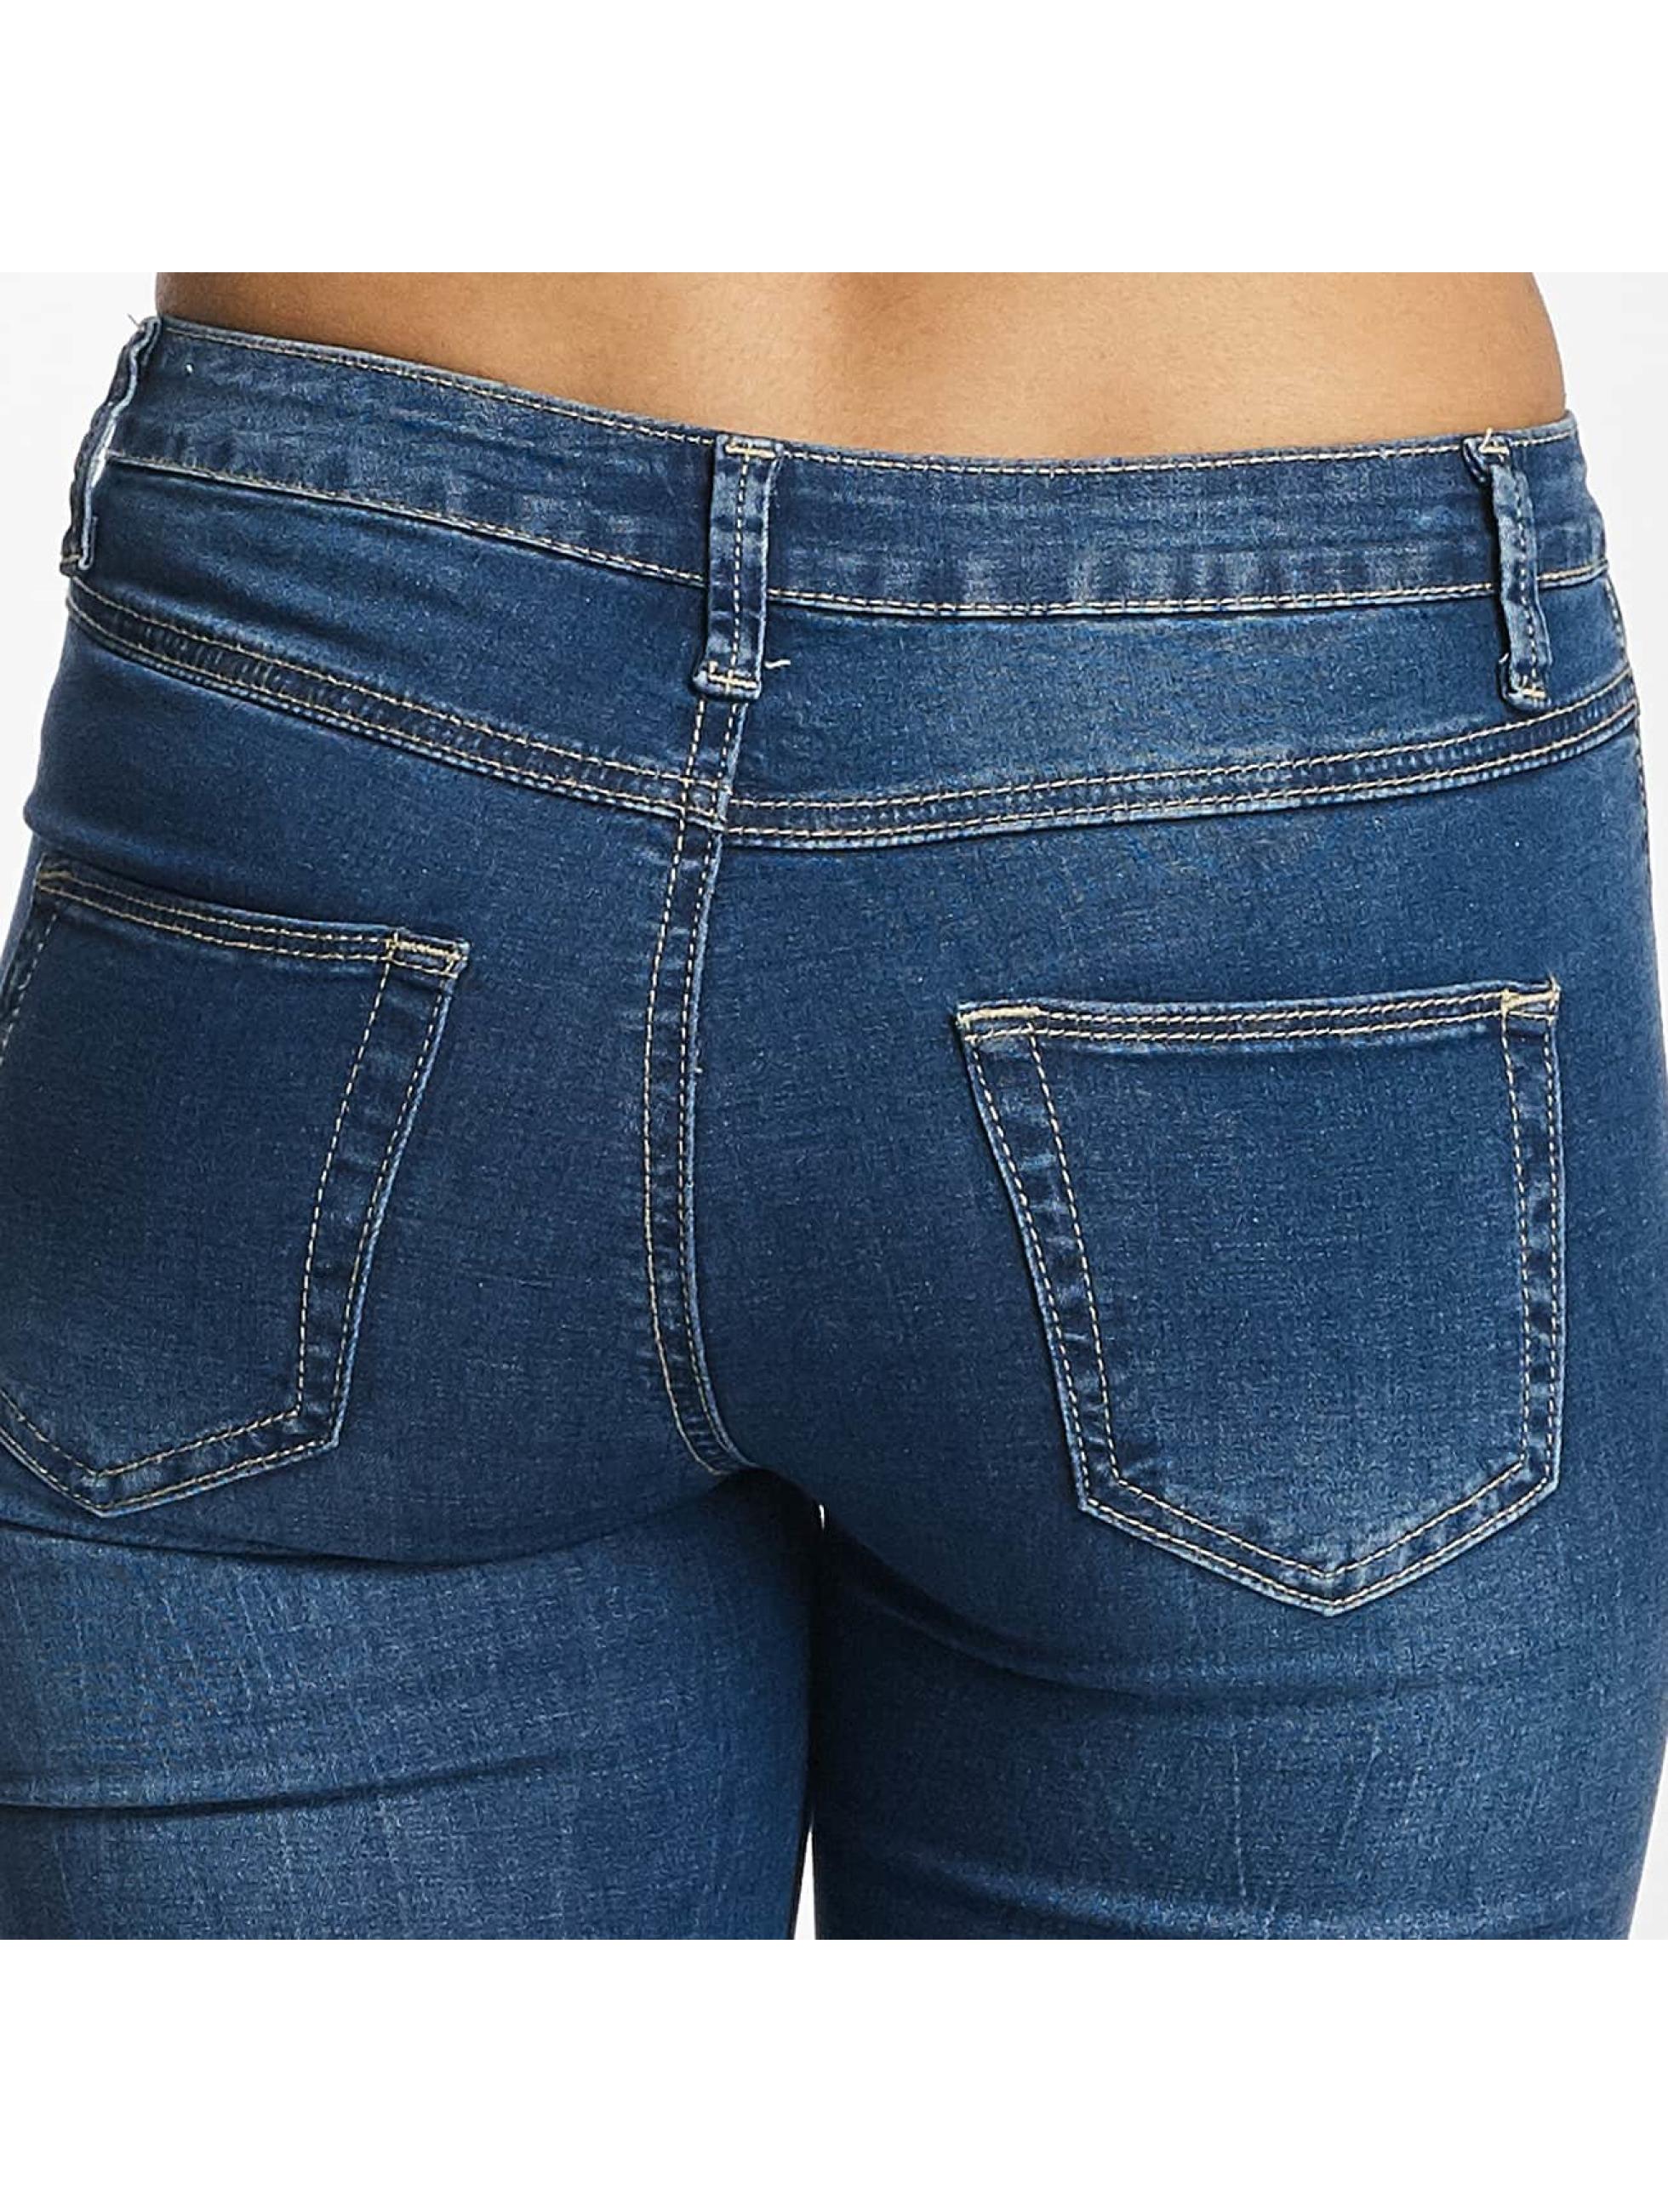 Hailys Skinny Jeans Bella blue